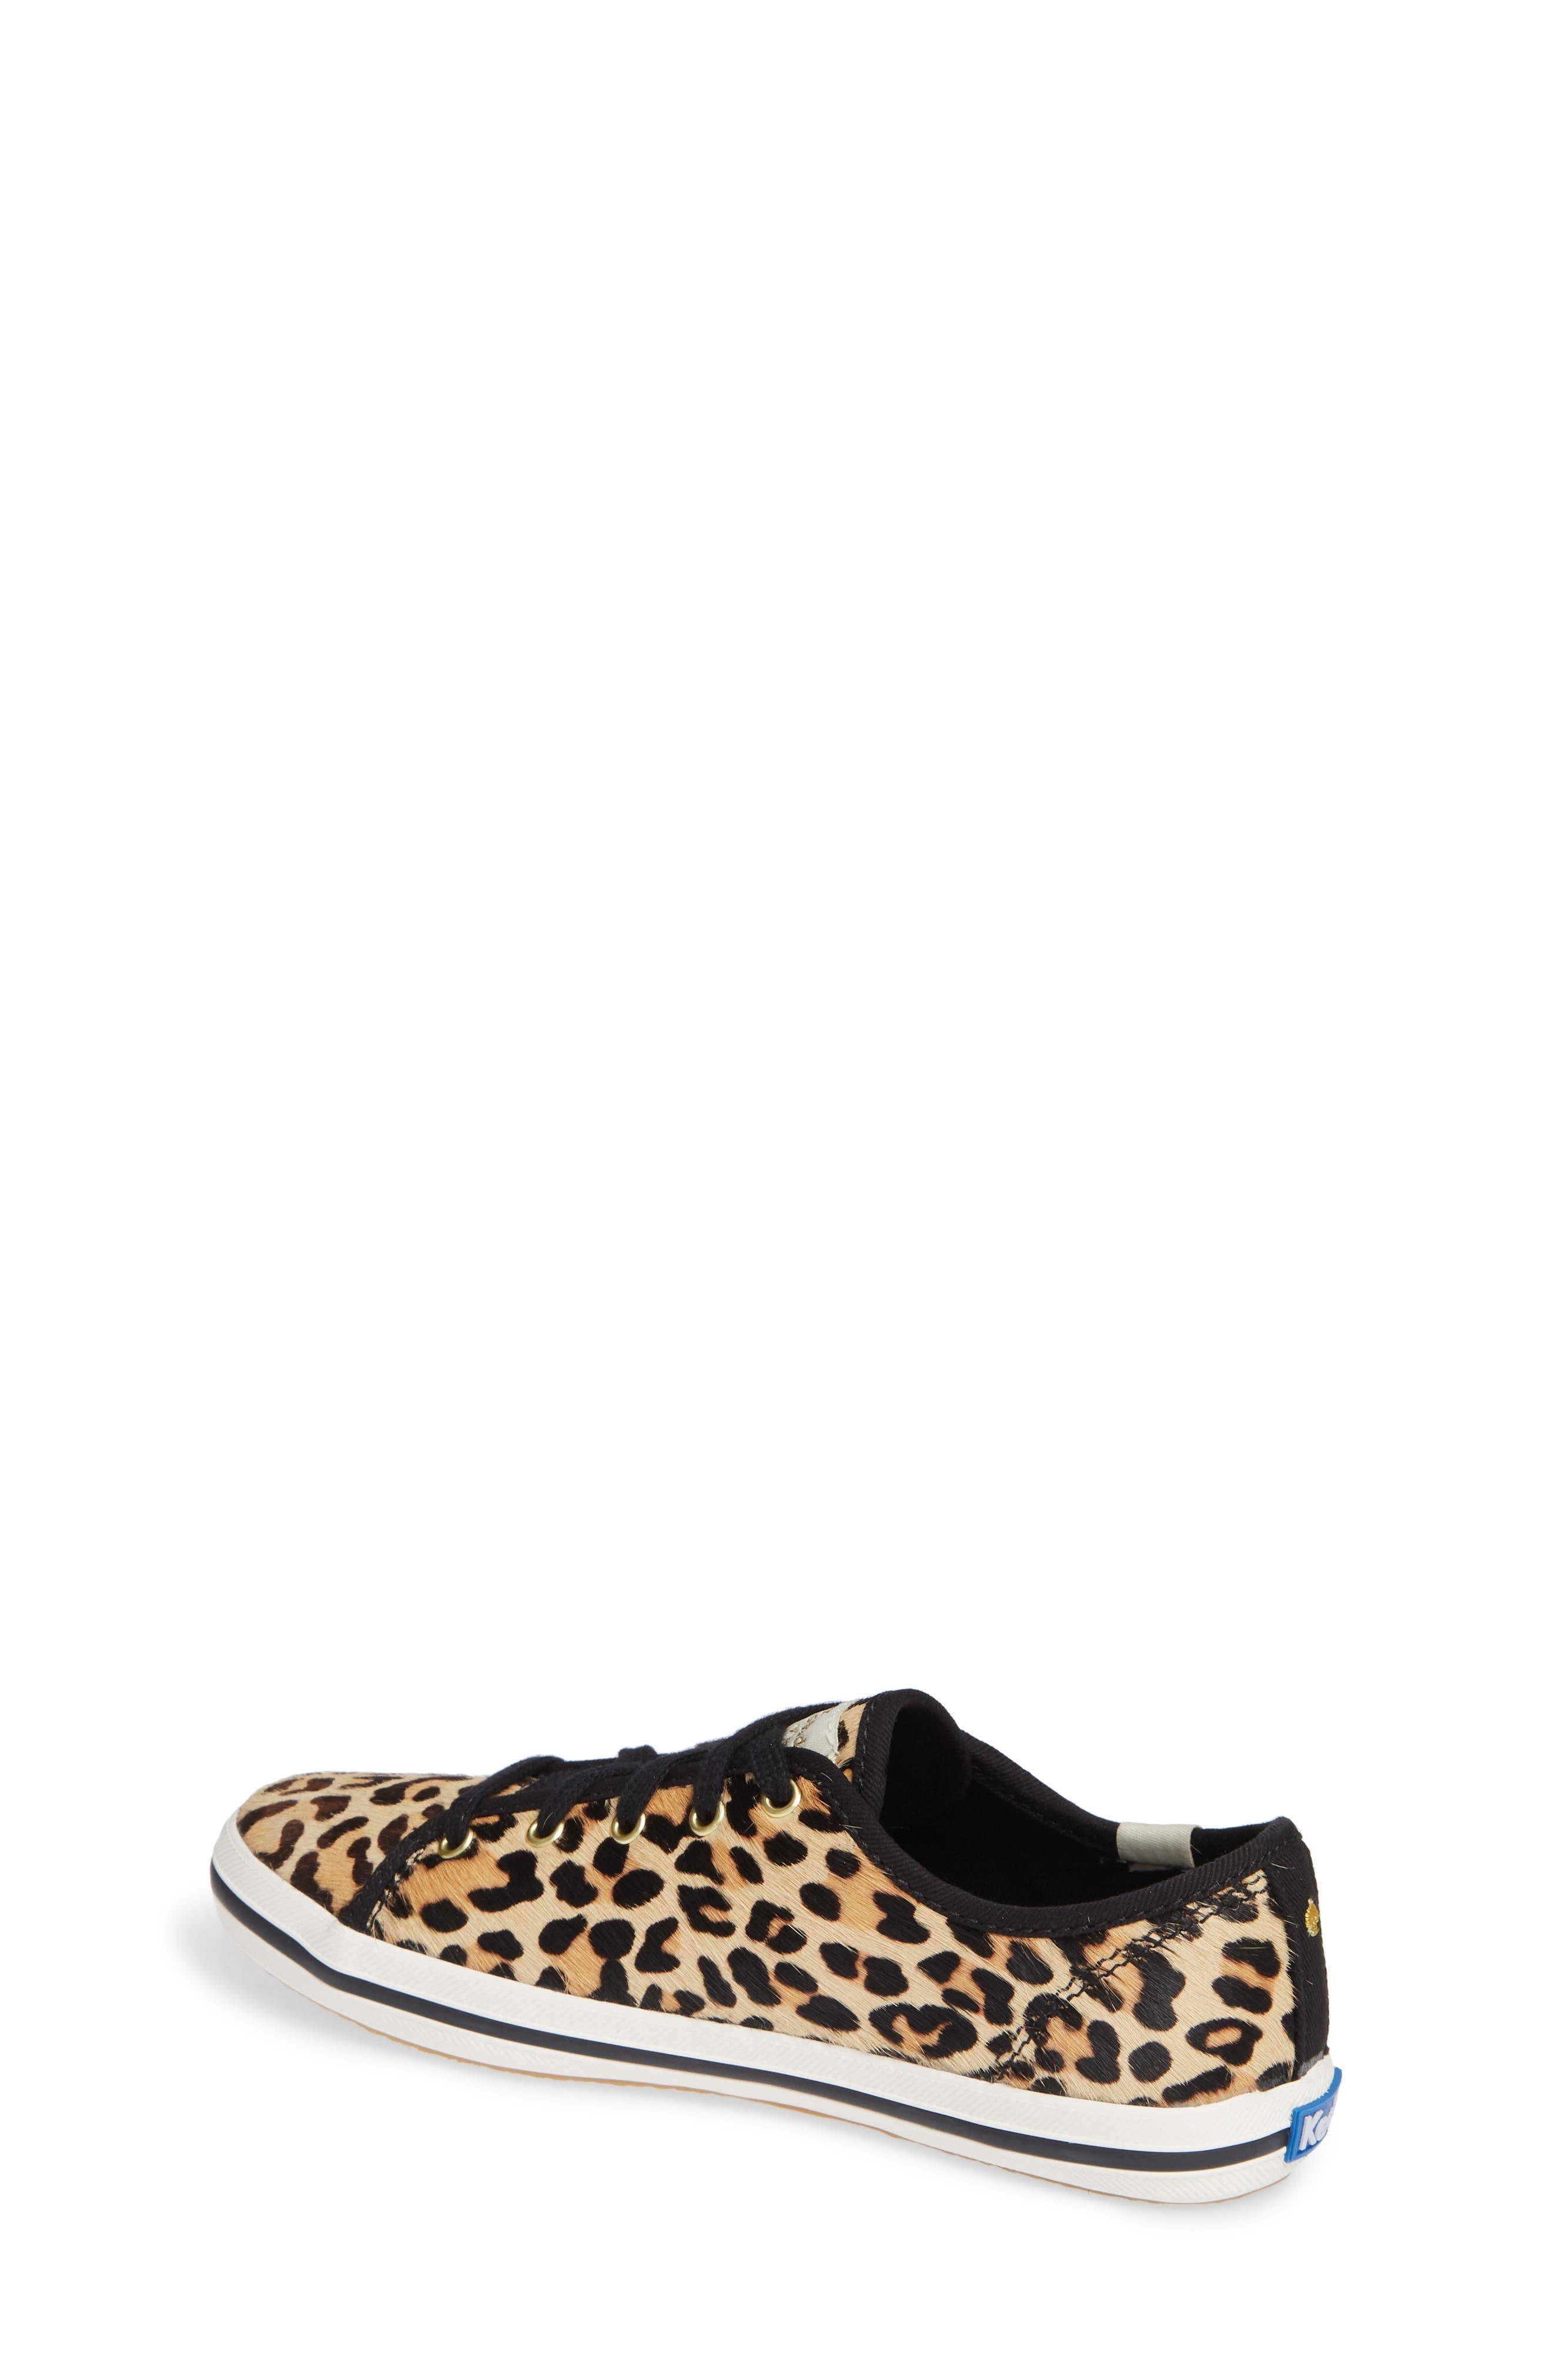 for kate spade new york kickstart genuine calf hair sneaker,                             Alternate thumbnail 2, color,                             PRINTED PONY